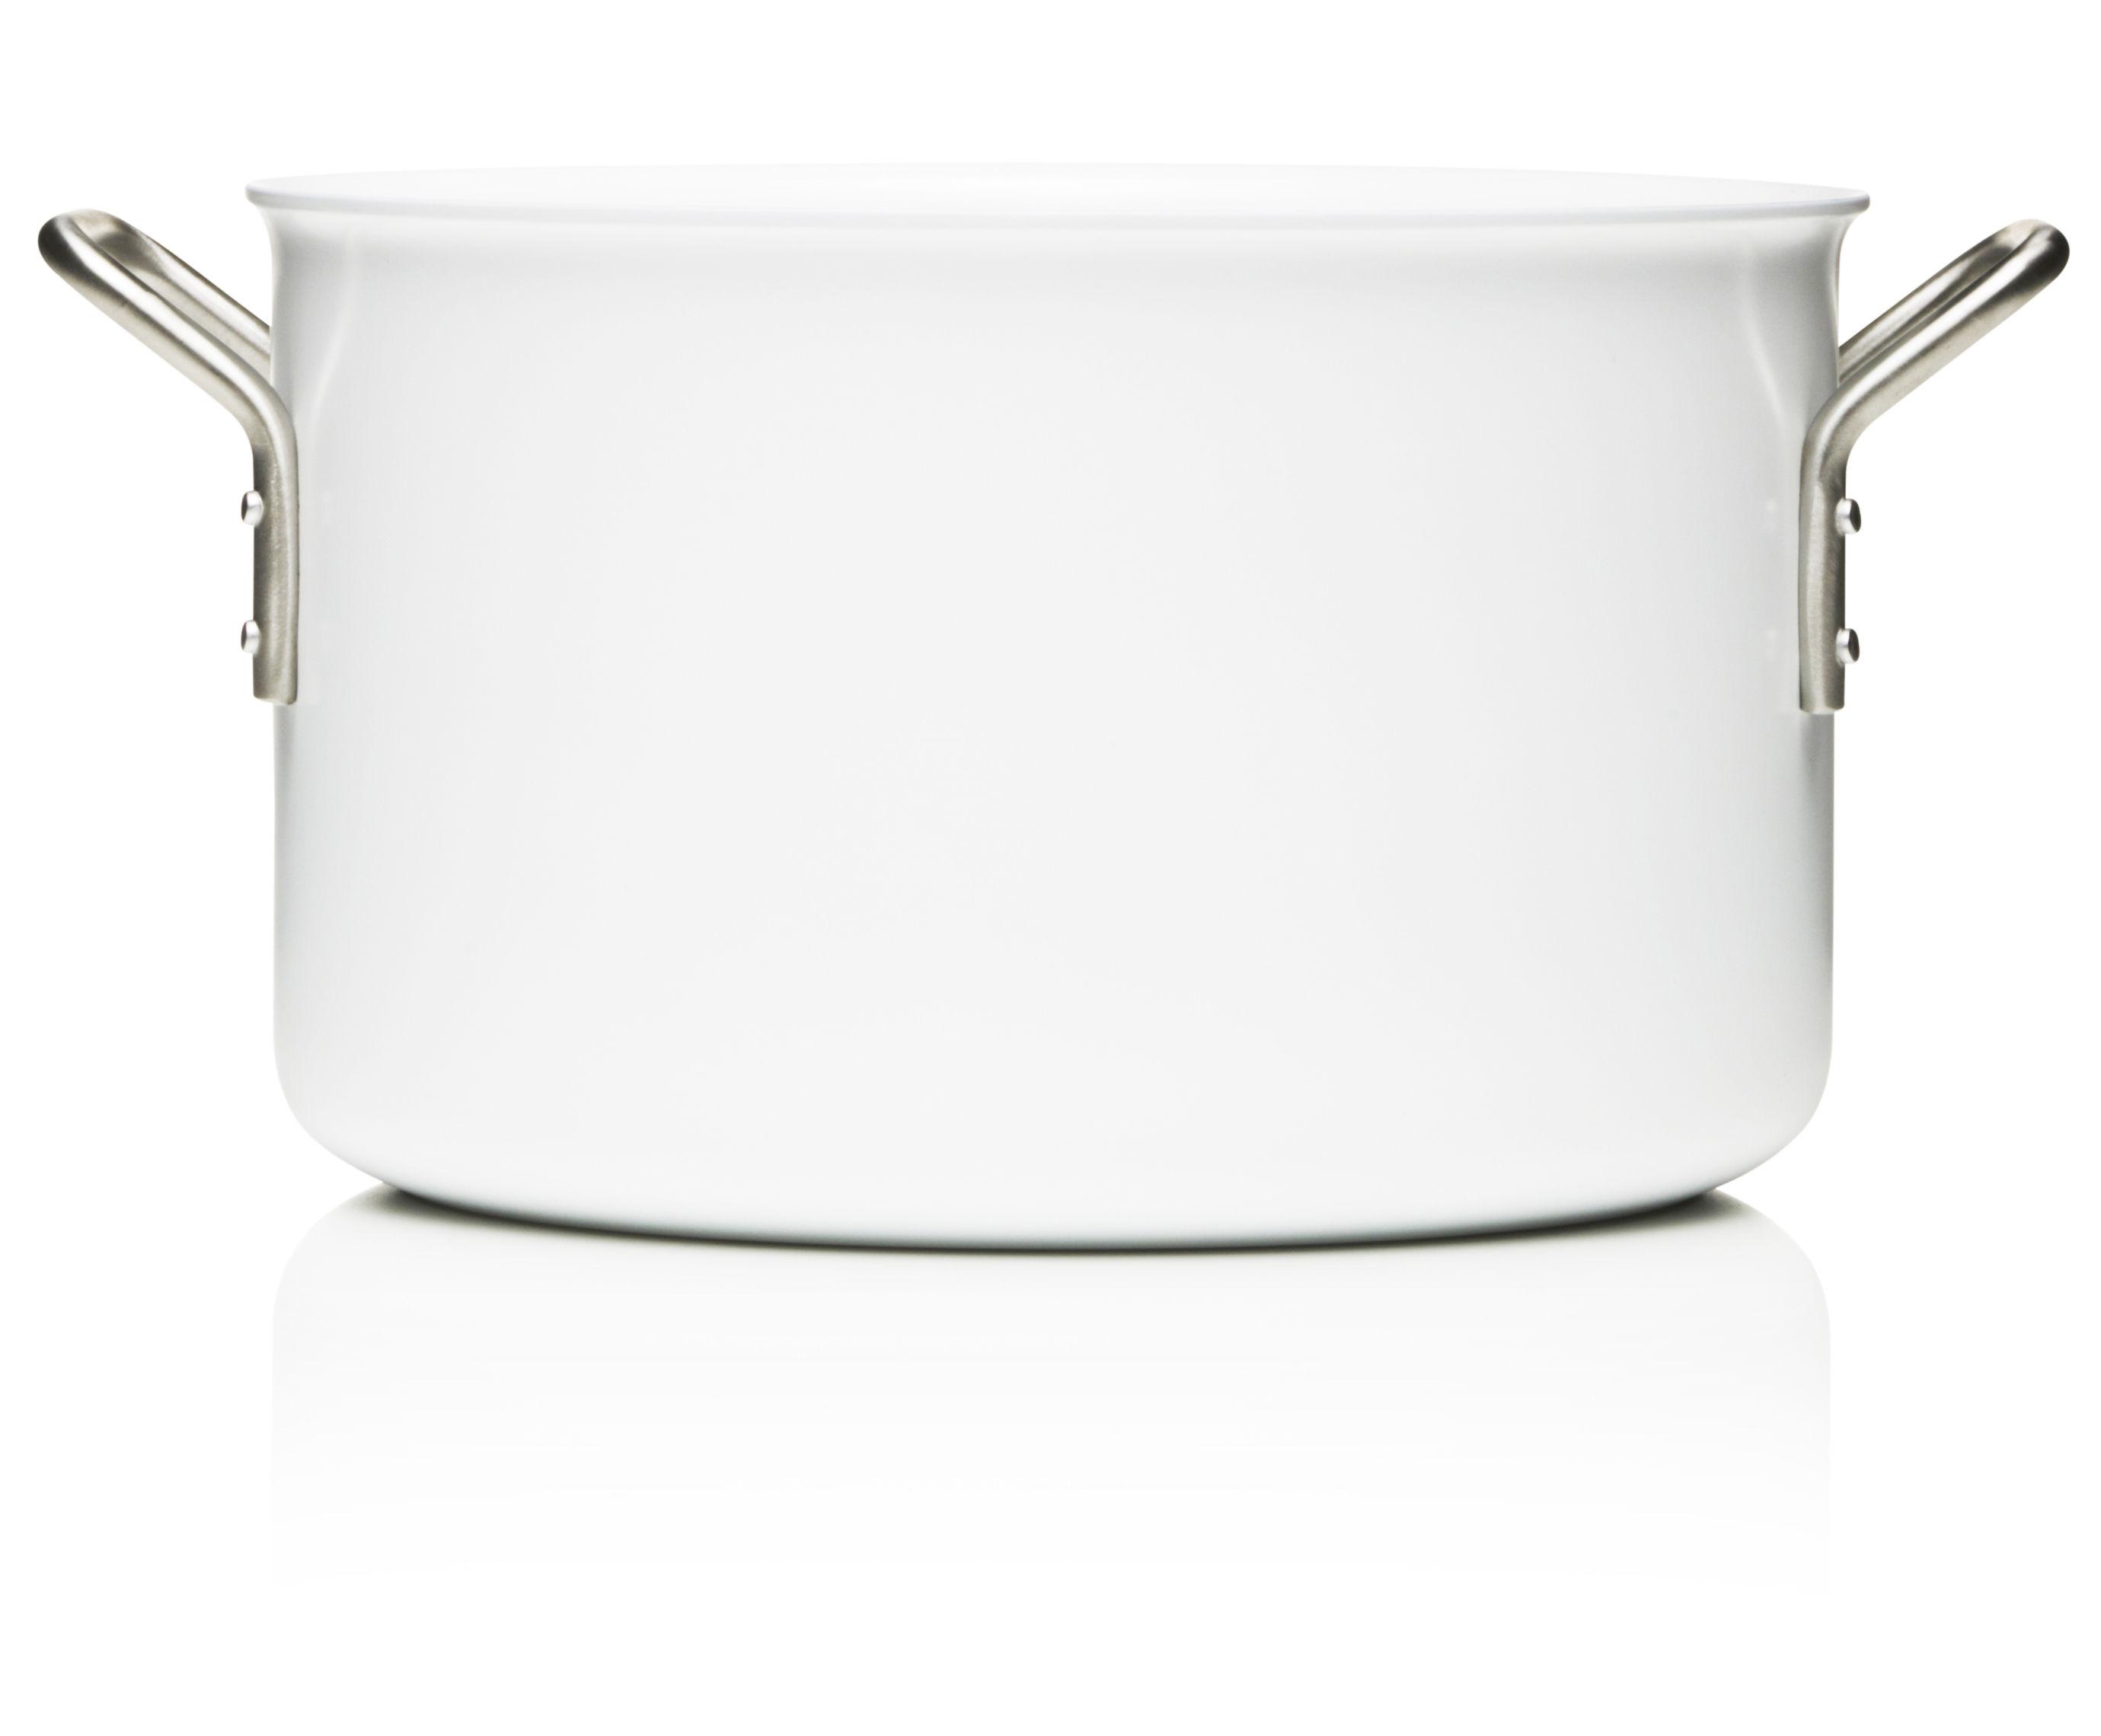 Kitchenware - Pots & Pans - White Line Stewpot - 7L - Web exclusivity by Eva Trio - White - Aluminium, Ceramic, Stainless steel